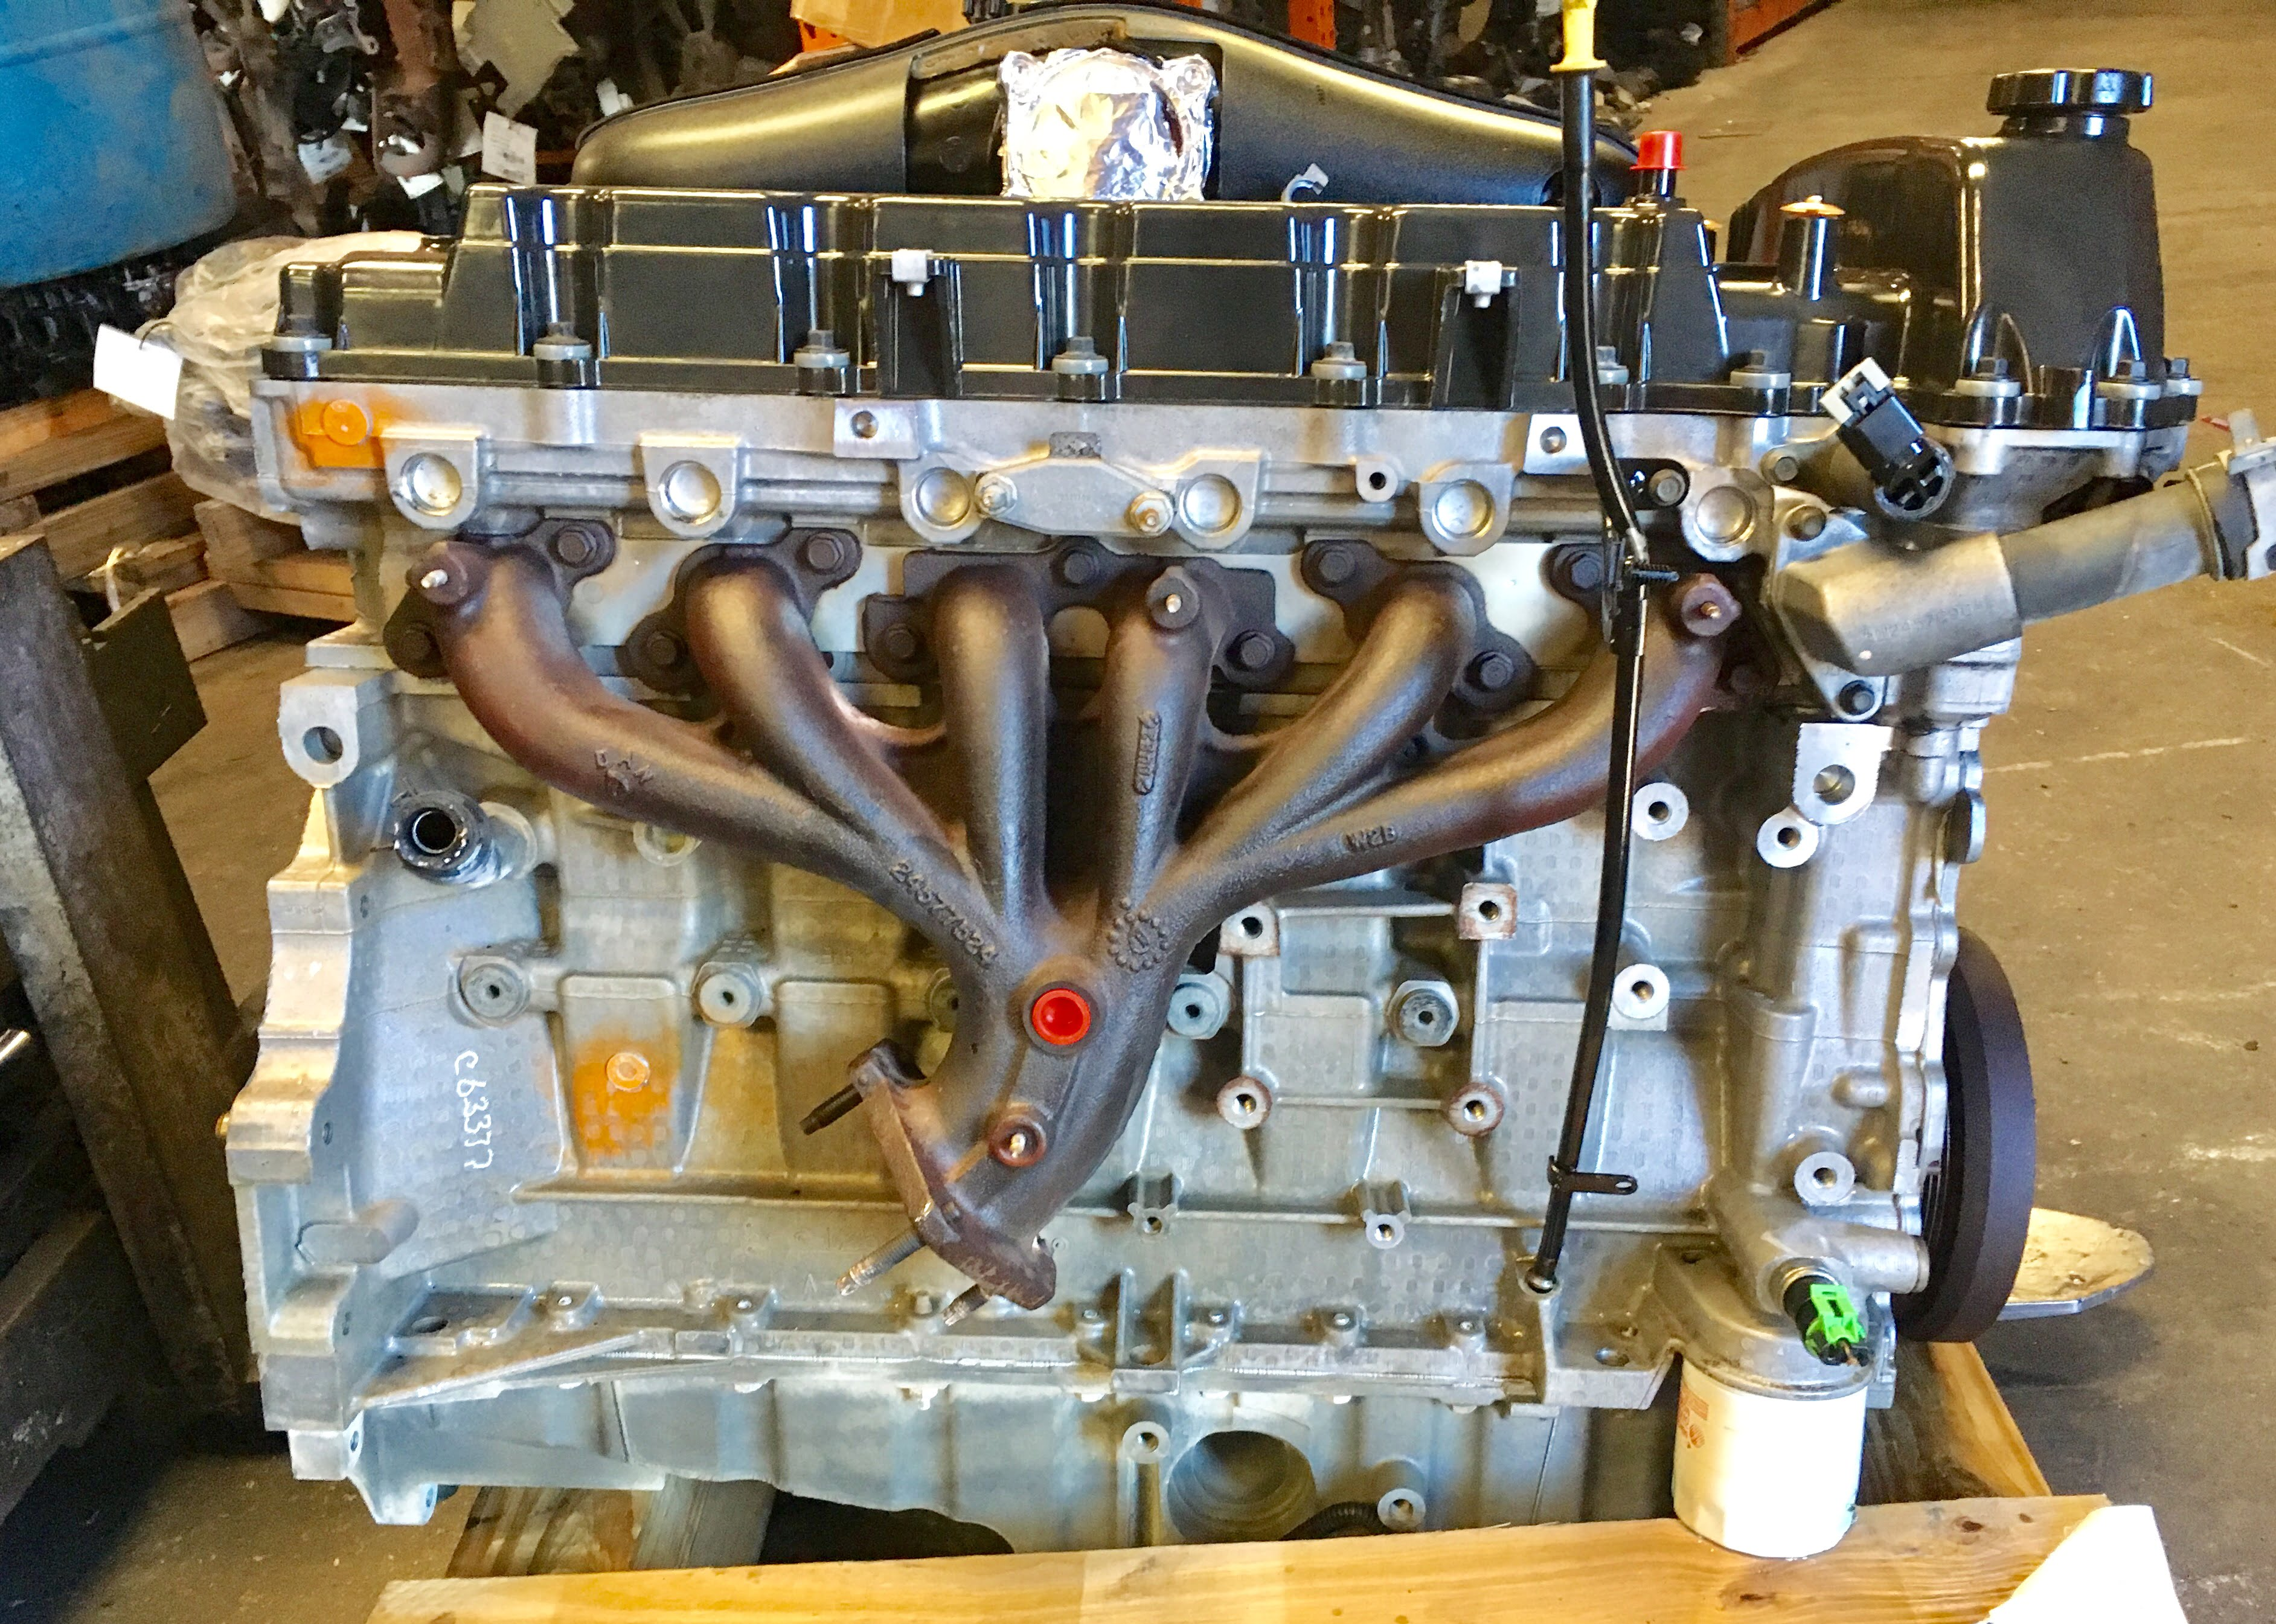 2006 Isuzu Ascender Engine Diagram 2004 Gmc Envoy Auto